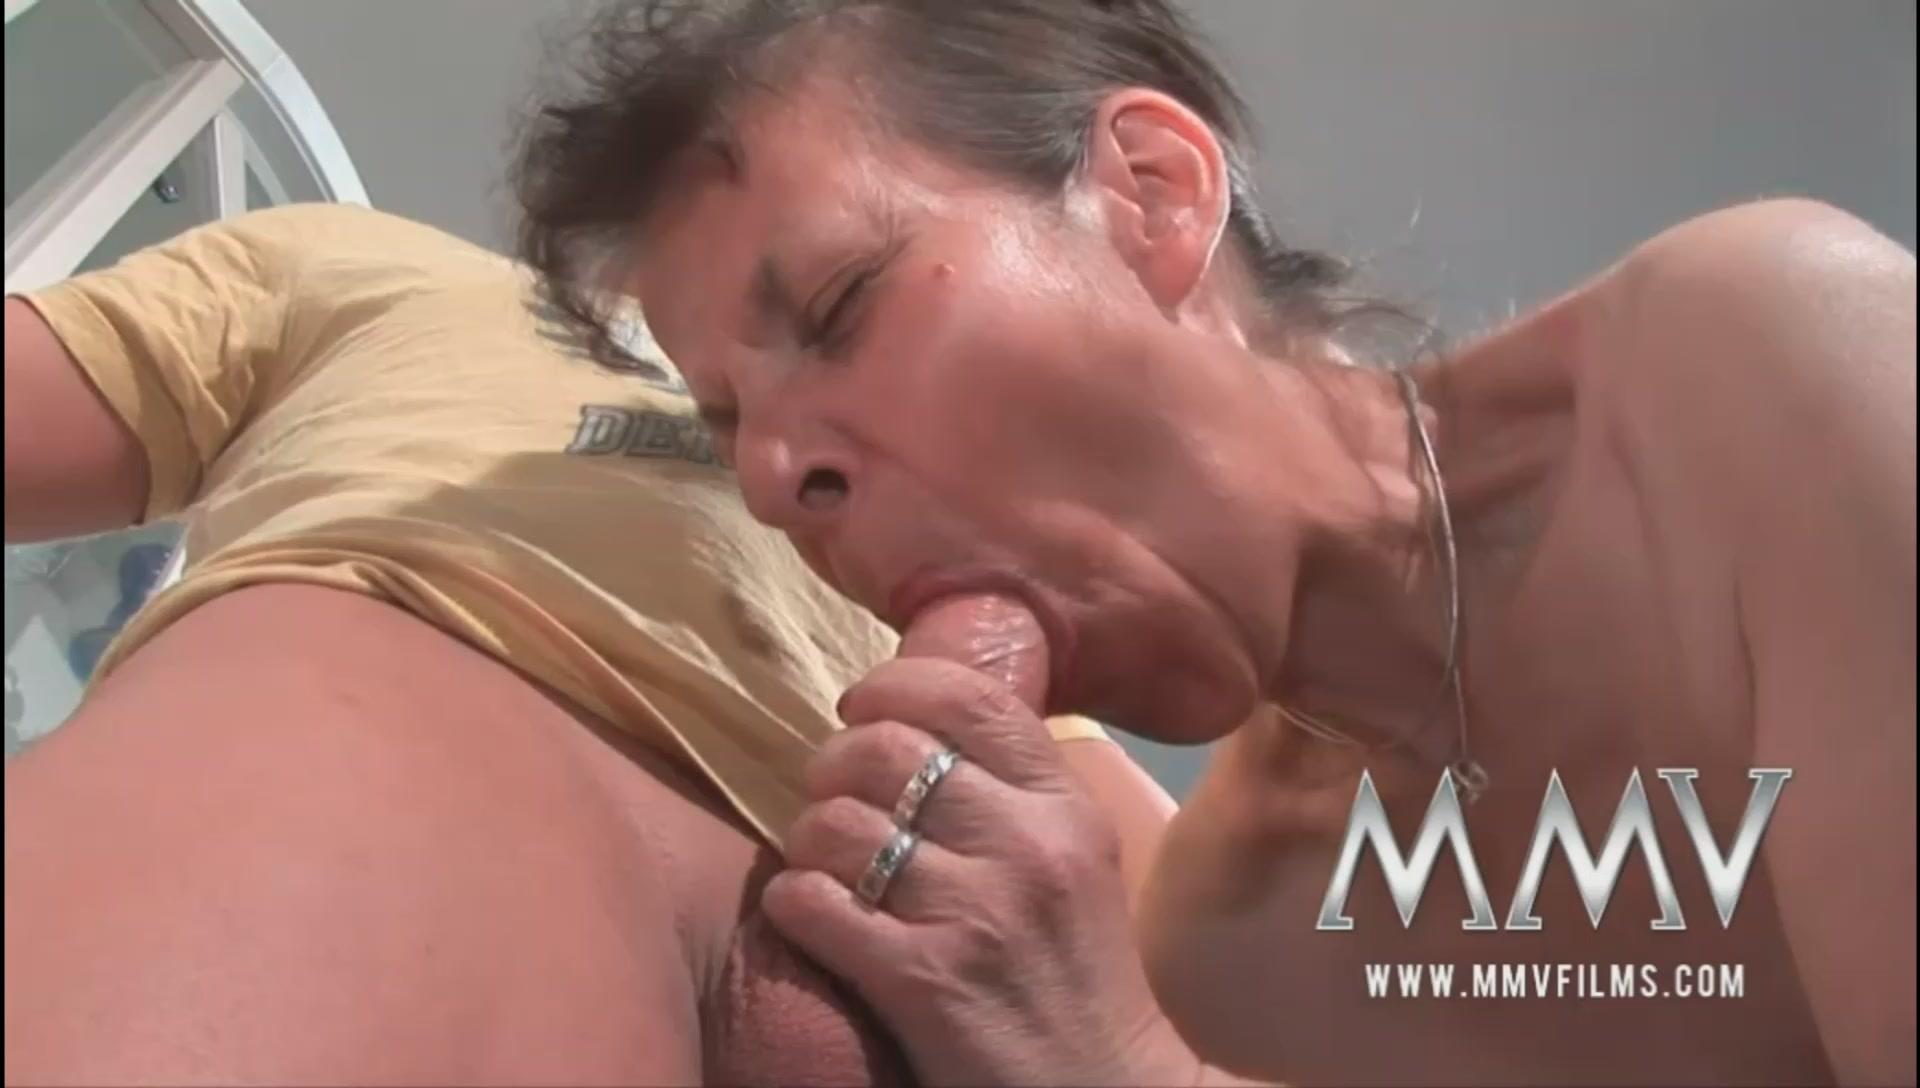 Mmvfilms german sperm diva loves bukkake gokkun - 2 part 3